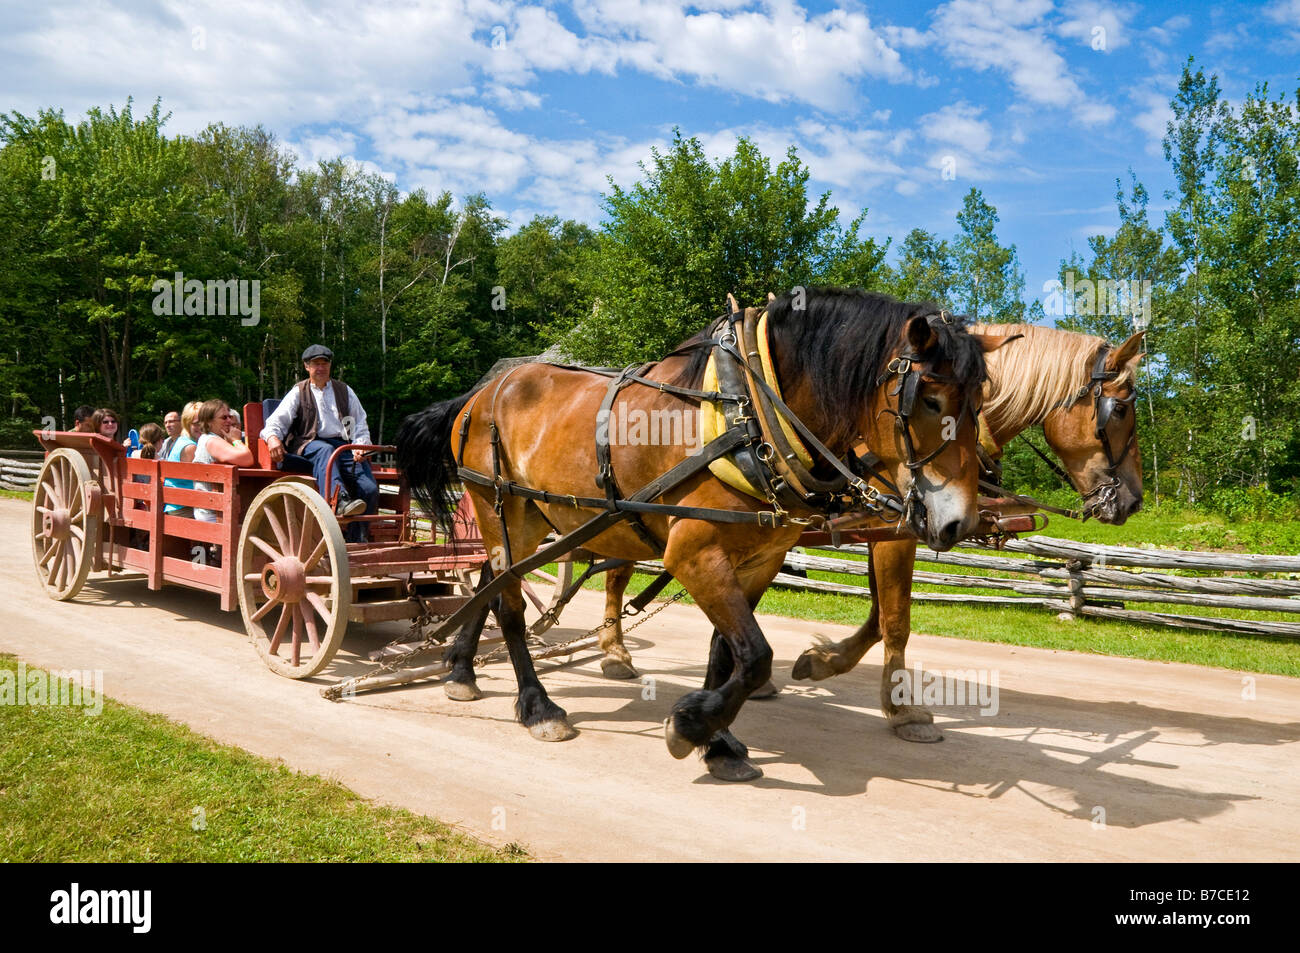 The historical Acadian Village New Brunswick Canada Stock Photo